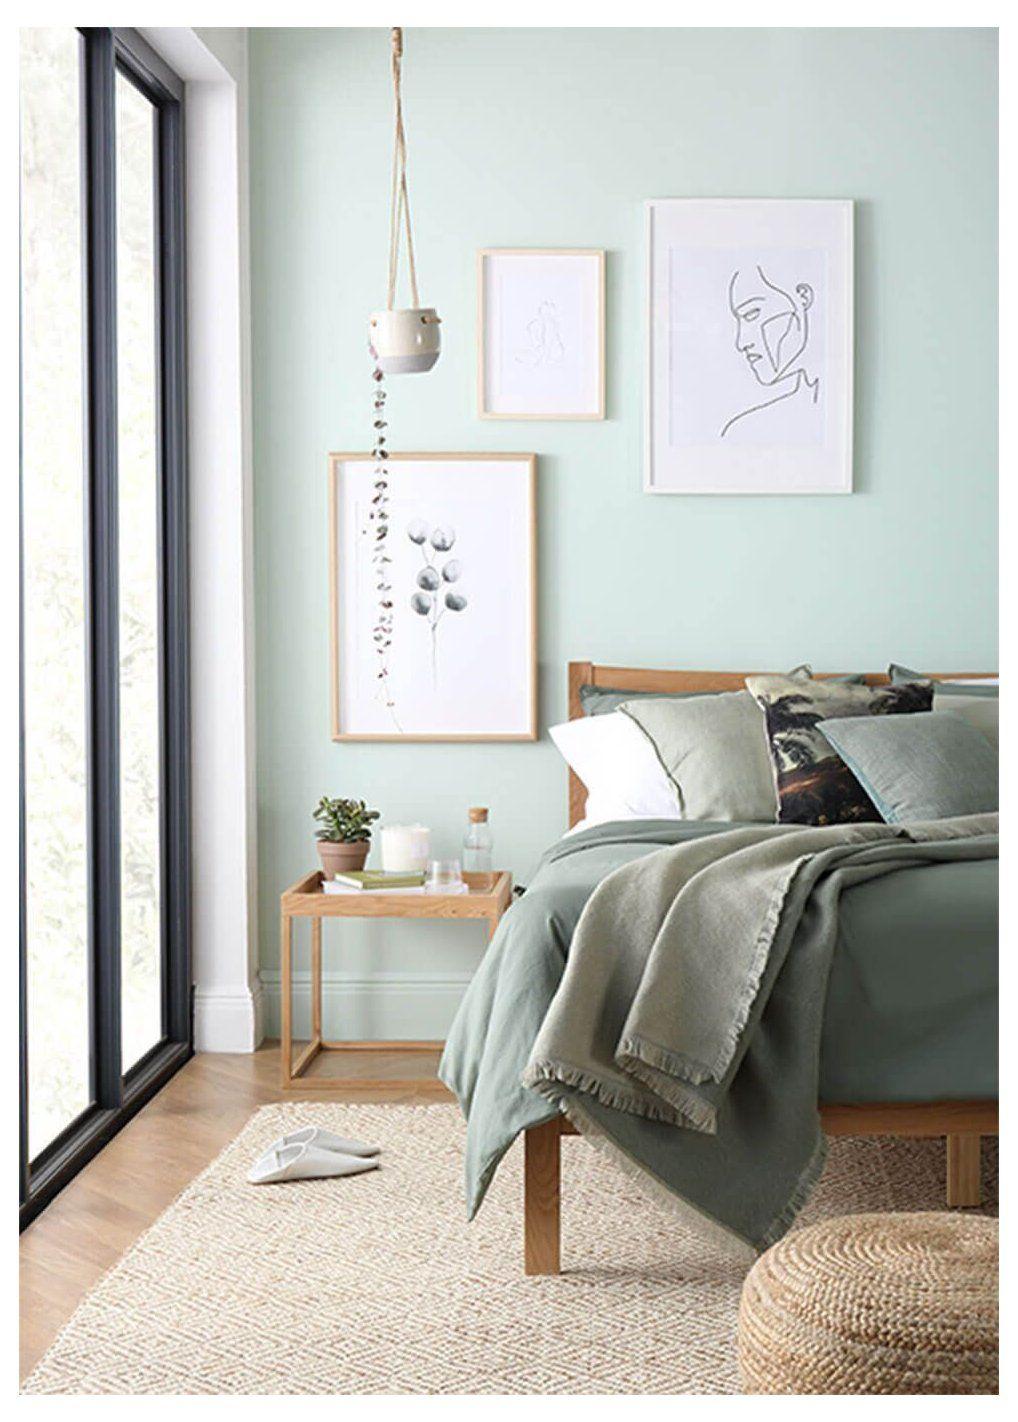 7 Ways To Make A Green Bedroom Look Good Light Green Room Ideas Bedroom Lightgreenroomideasbedroo Bedroom Interior Sage Green Bedroom Green Bedroom Decor Bedroom decor ideas green